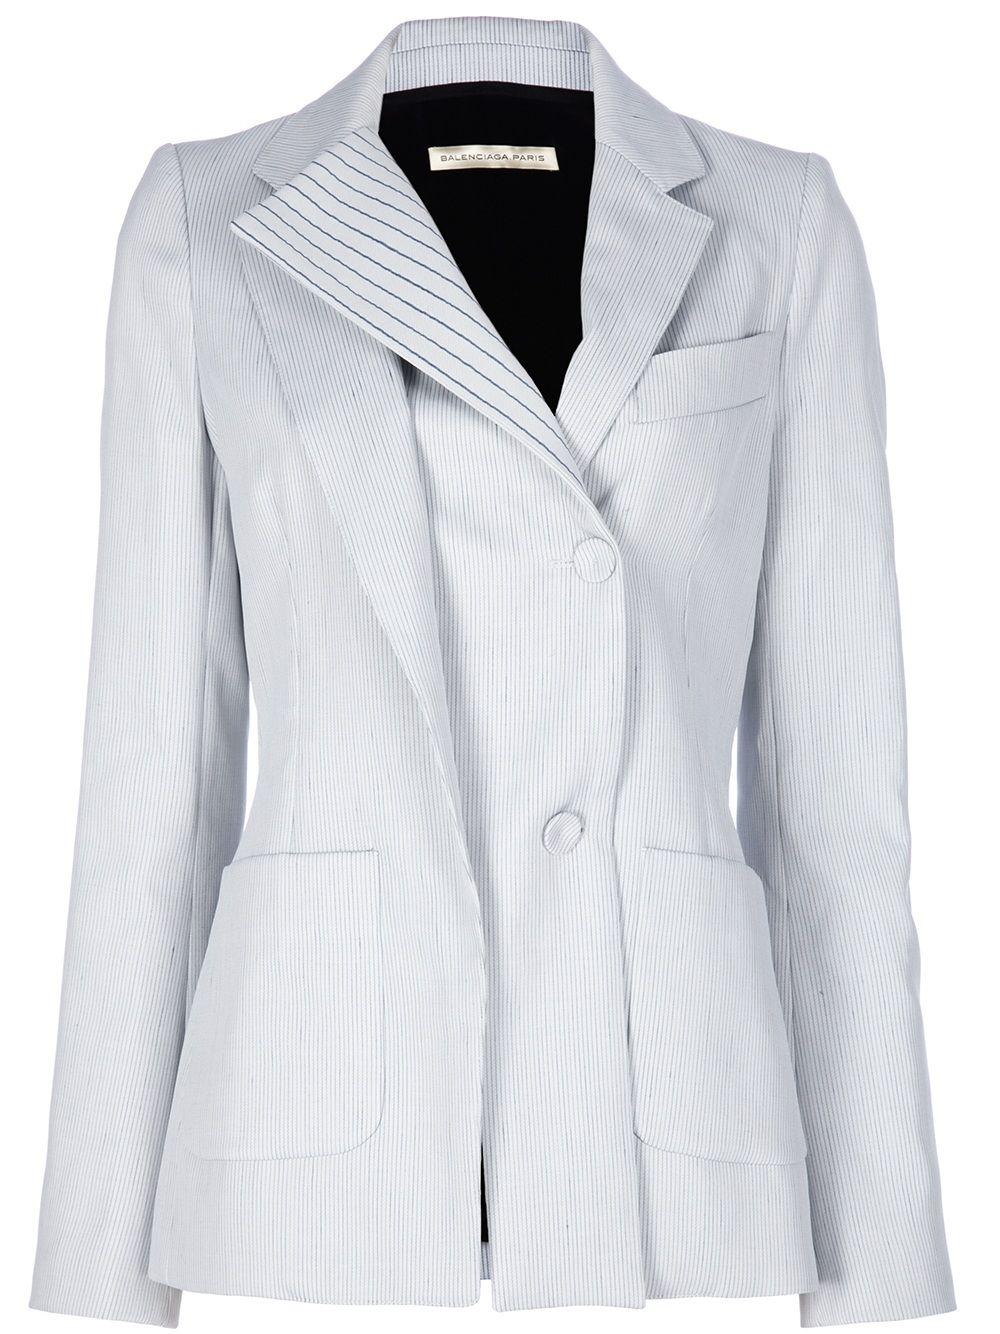 BALENCIAGA layered blazer